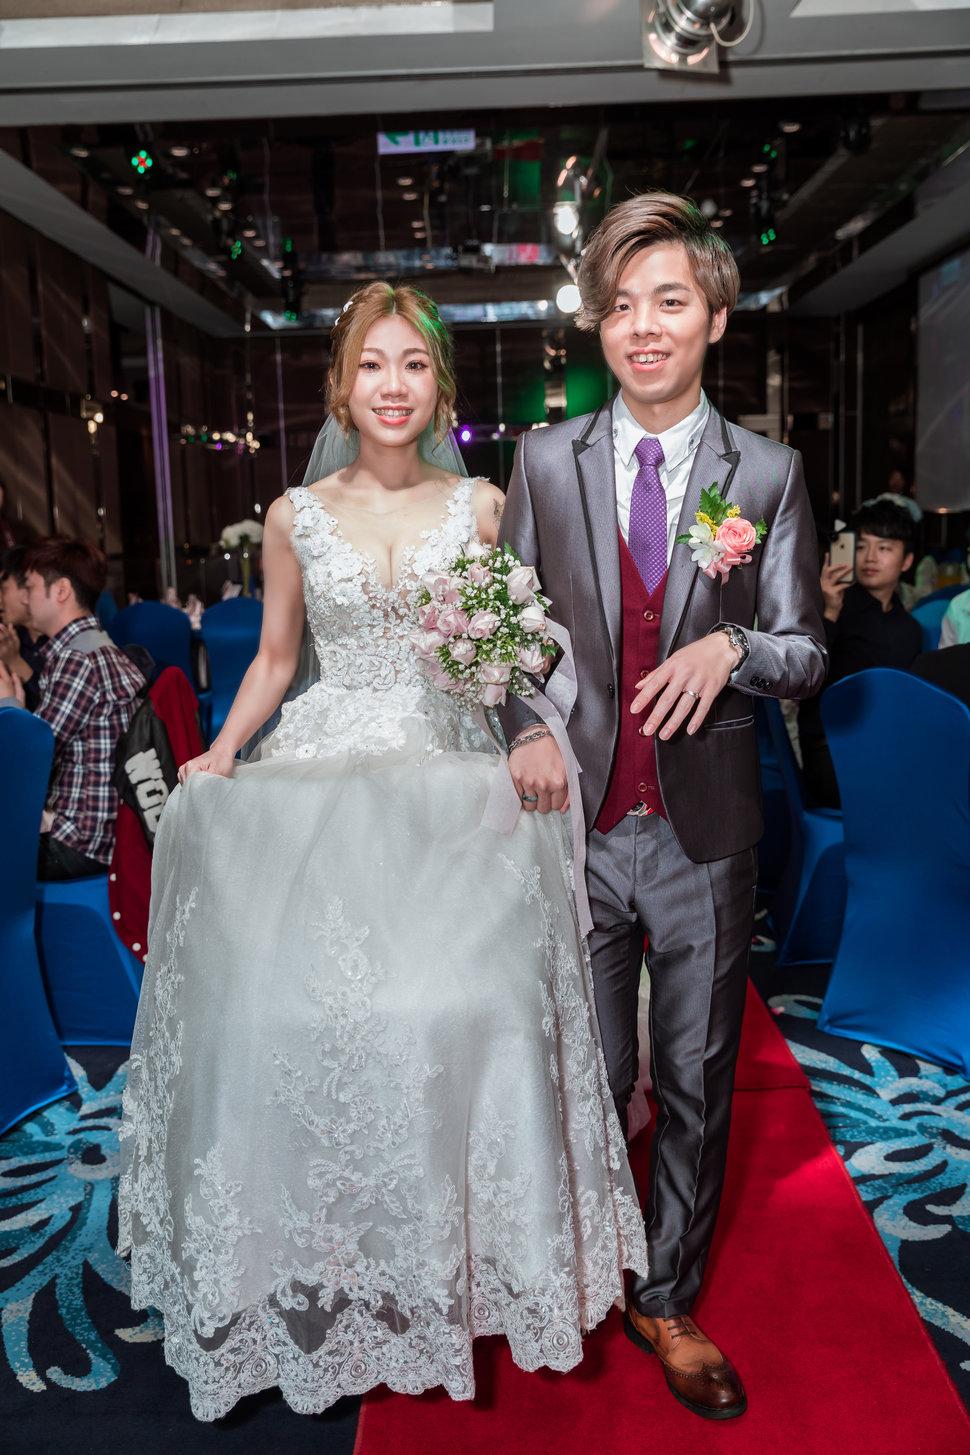 5D4_3901 - Promaker婚禮紀錄攝影團隊婚攝豪哥《結婚吧》